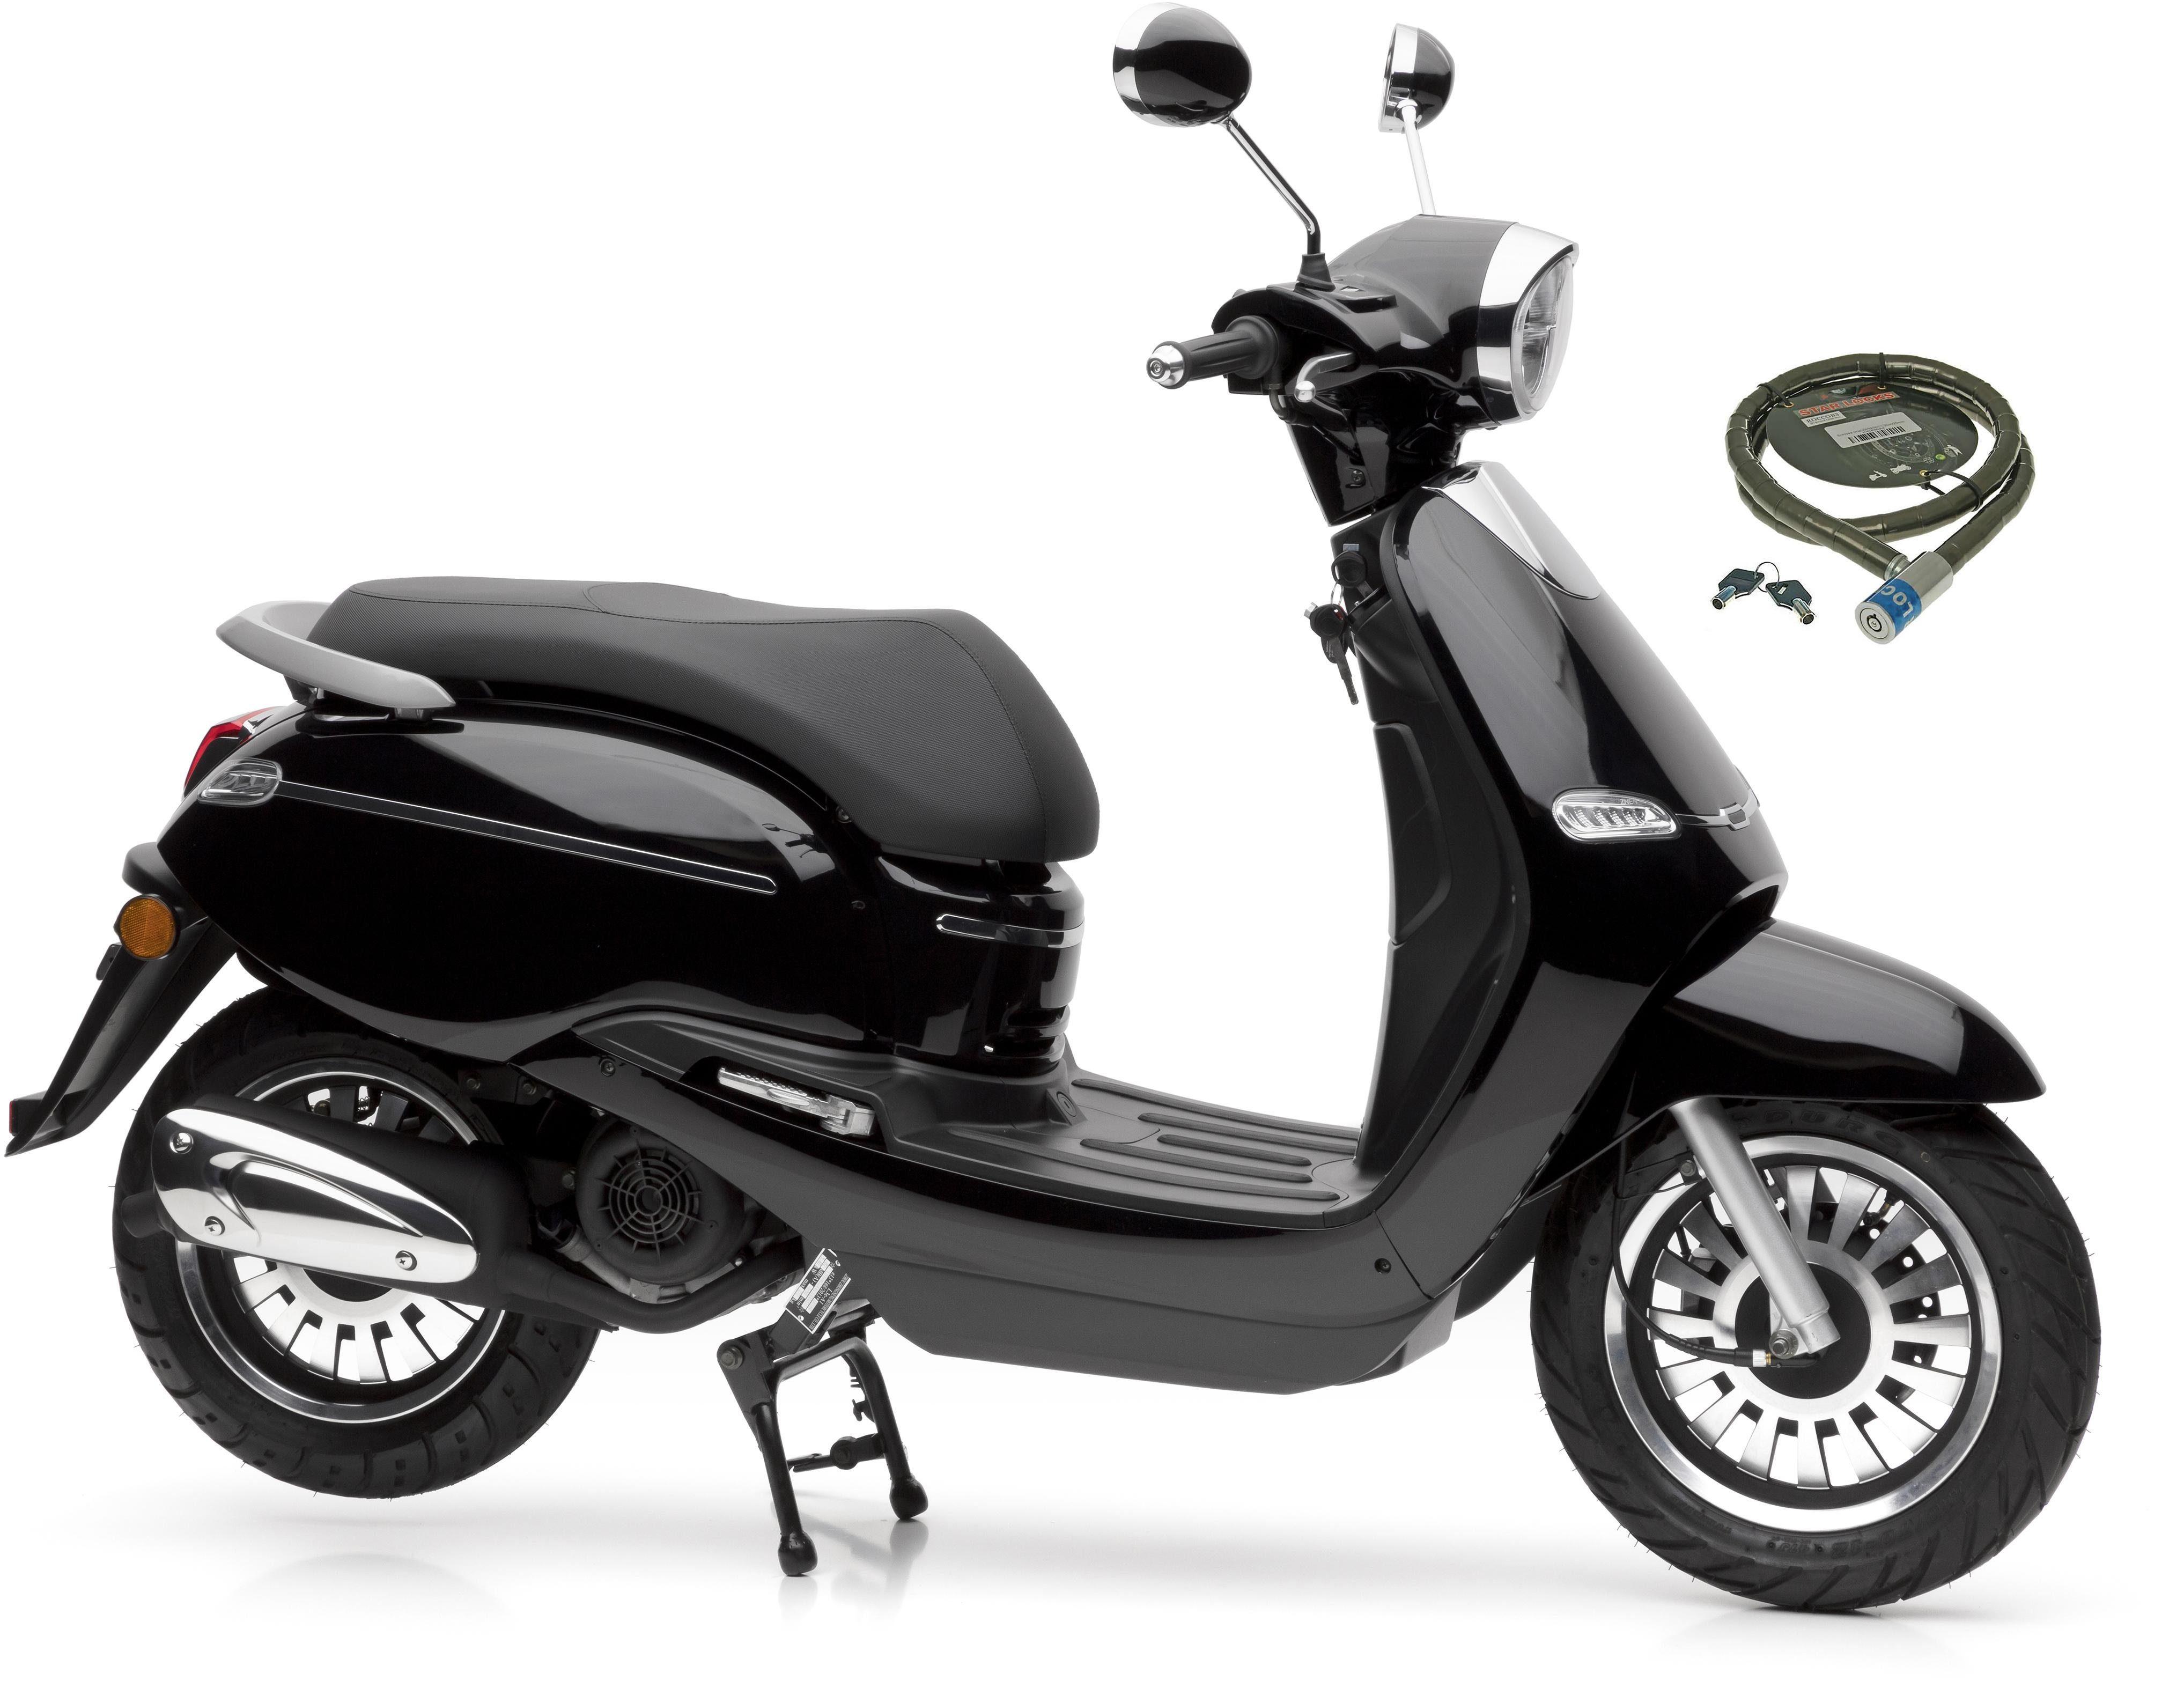 Nova Motors Motorroller »F10«, 125 ccm, 80 km/h, Euro 4, 125 ccm, 80 km/h